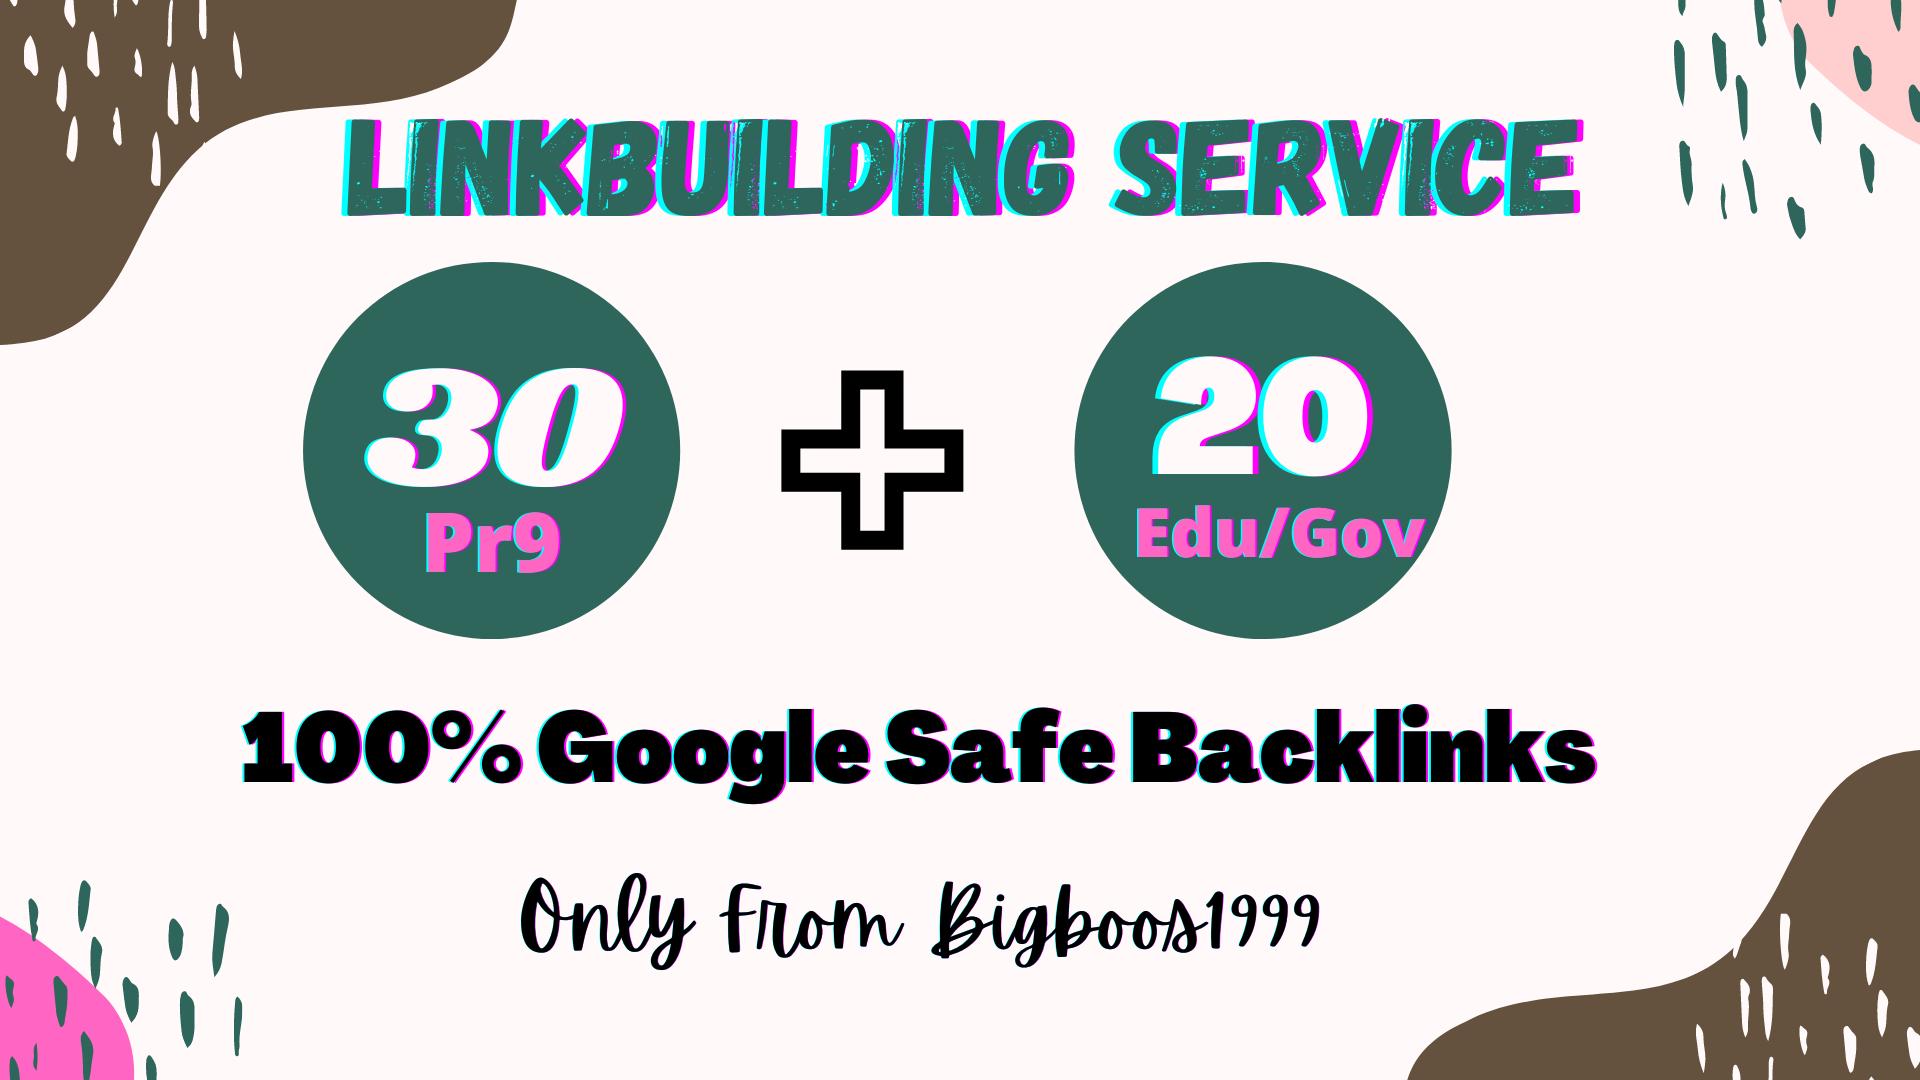 I will manually do 30 PR9 + 20 Edu/Gov High SEO Authority Backlinks - Skyrocket your Google RANKINGS